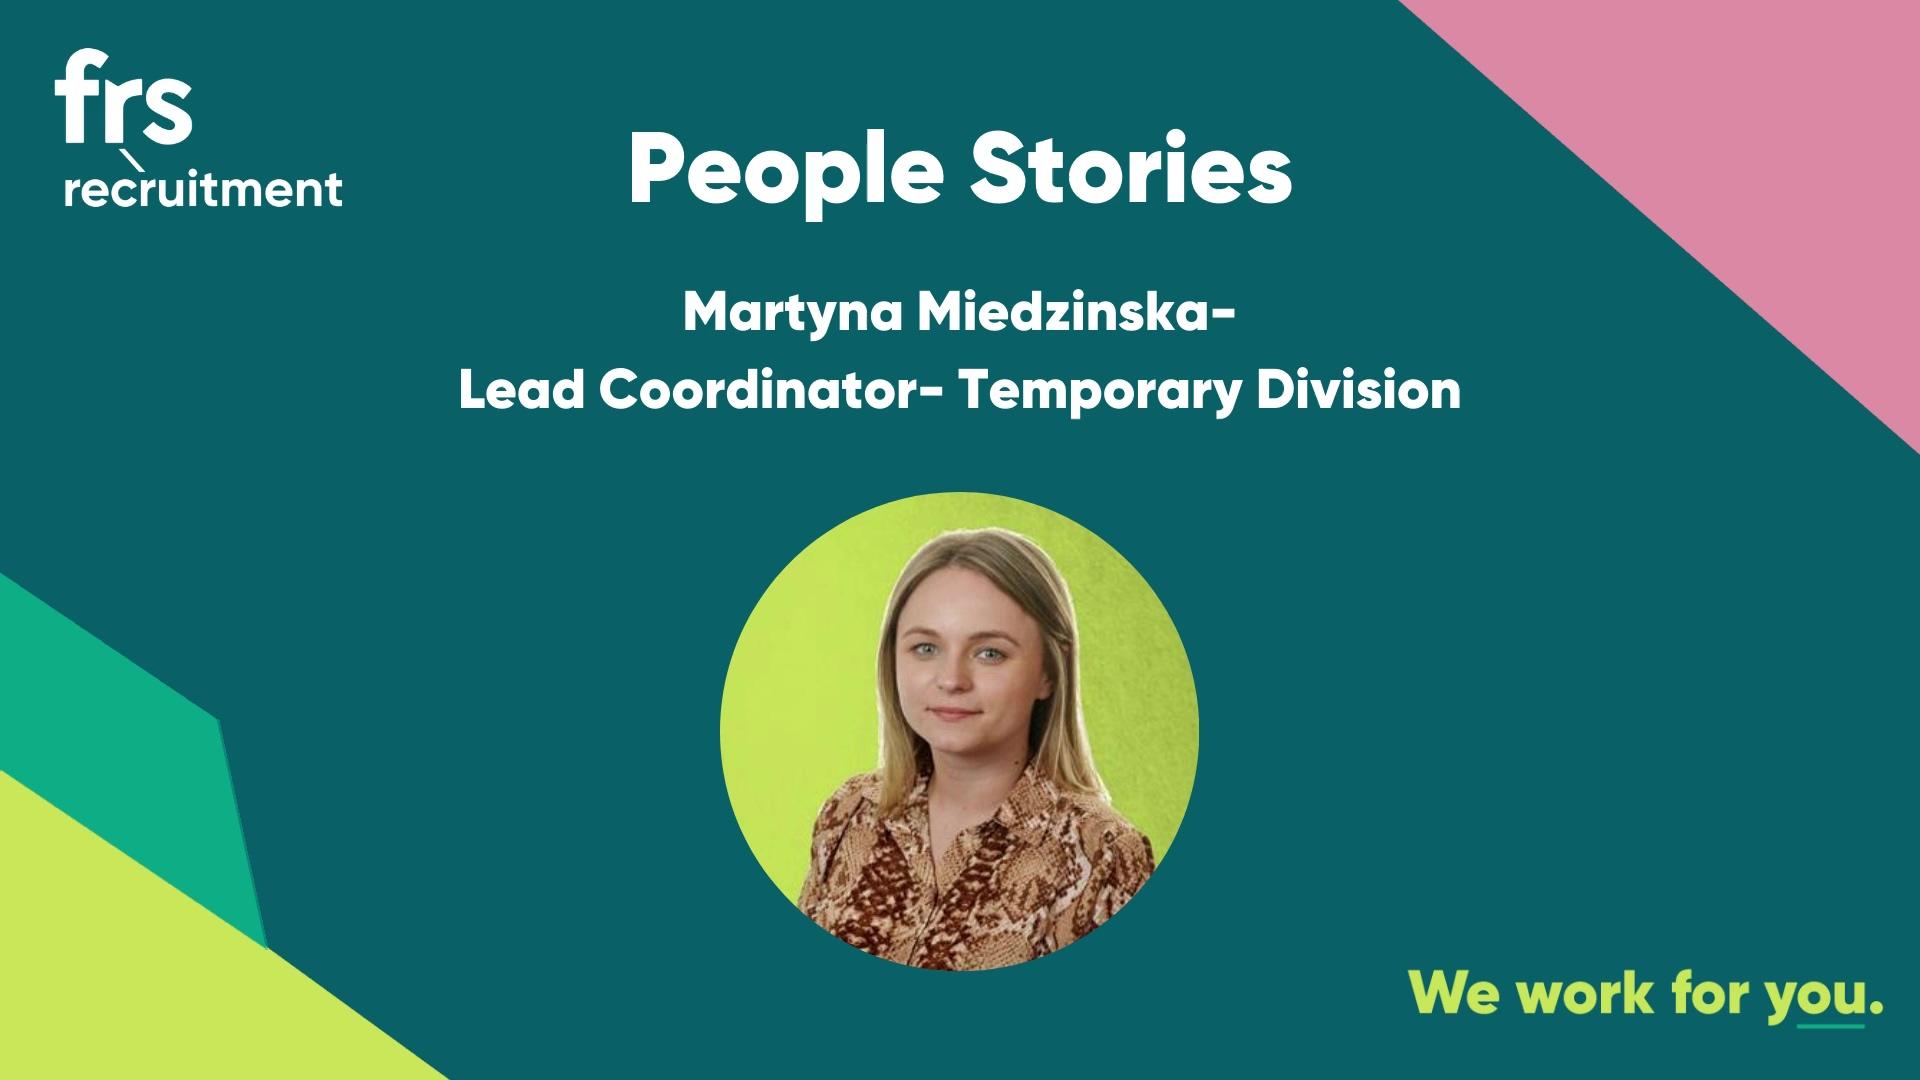 Martyna Miedzinska- Lead Coordinator Temporary Division